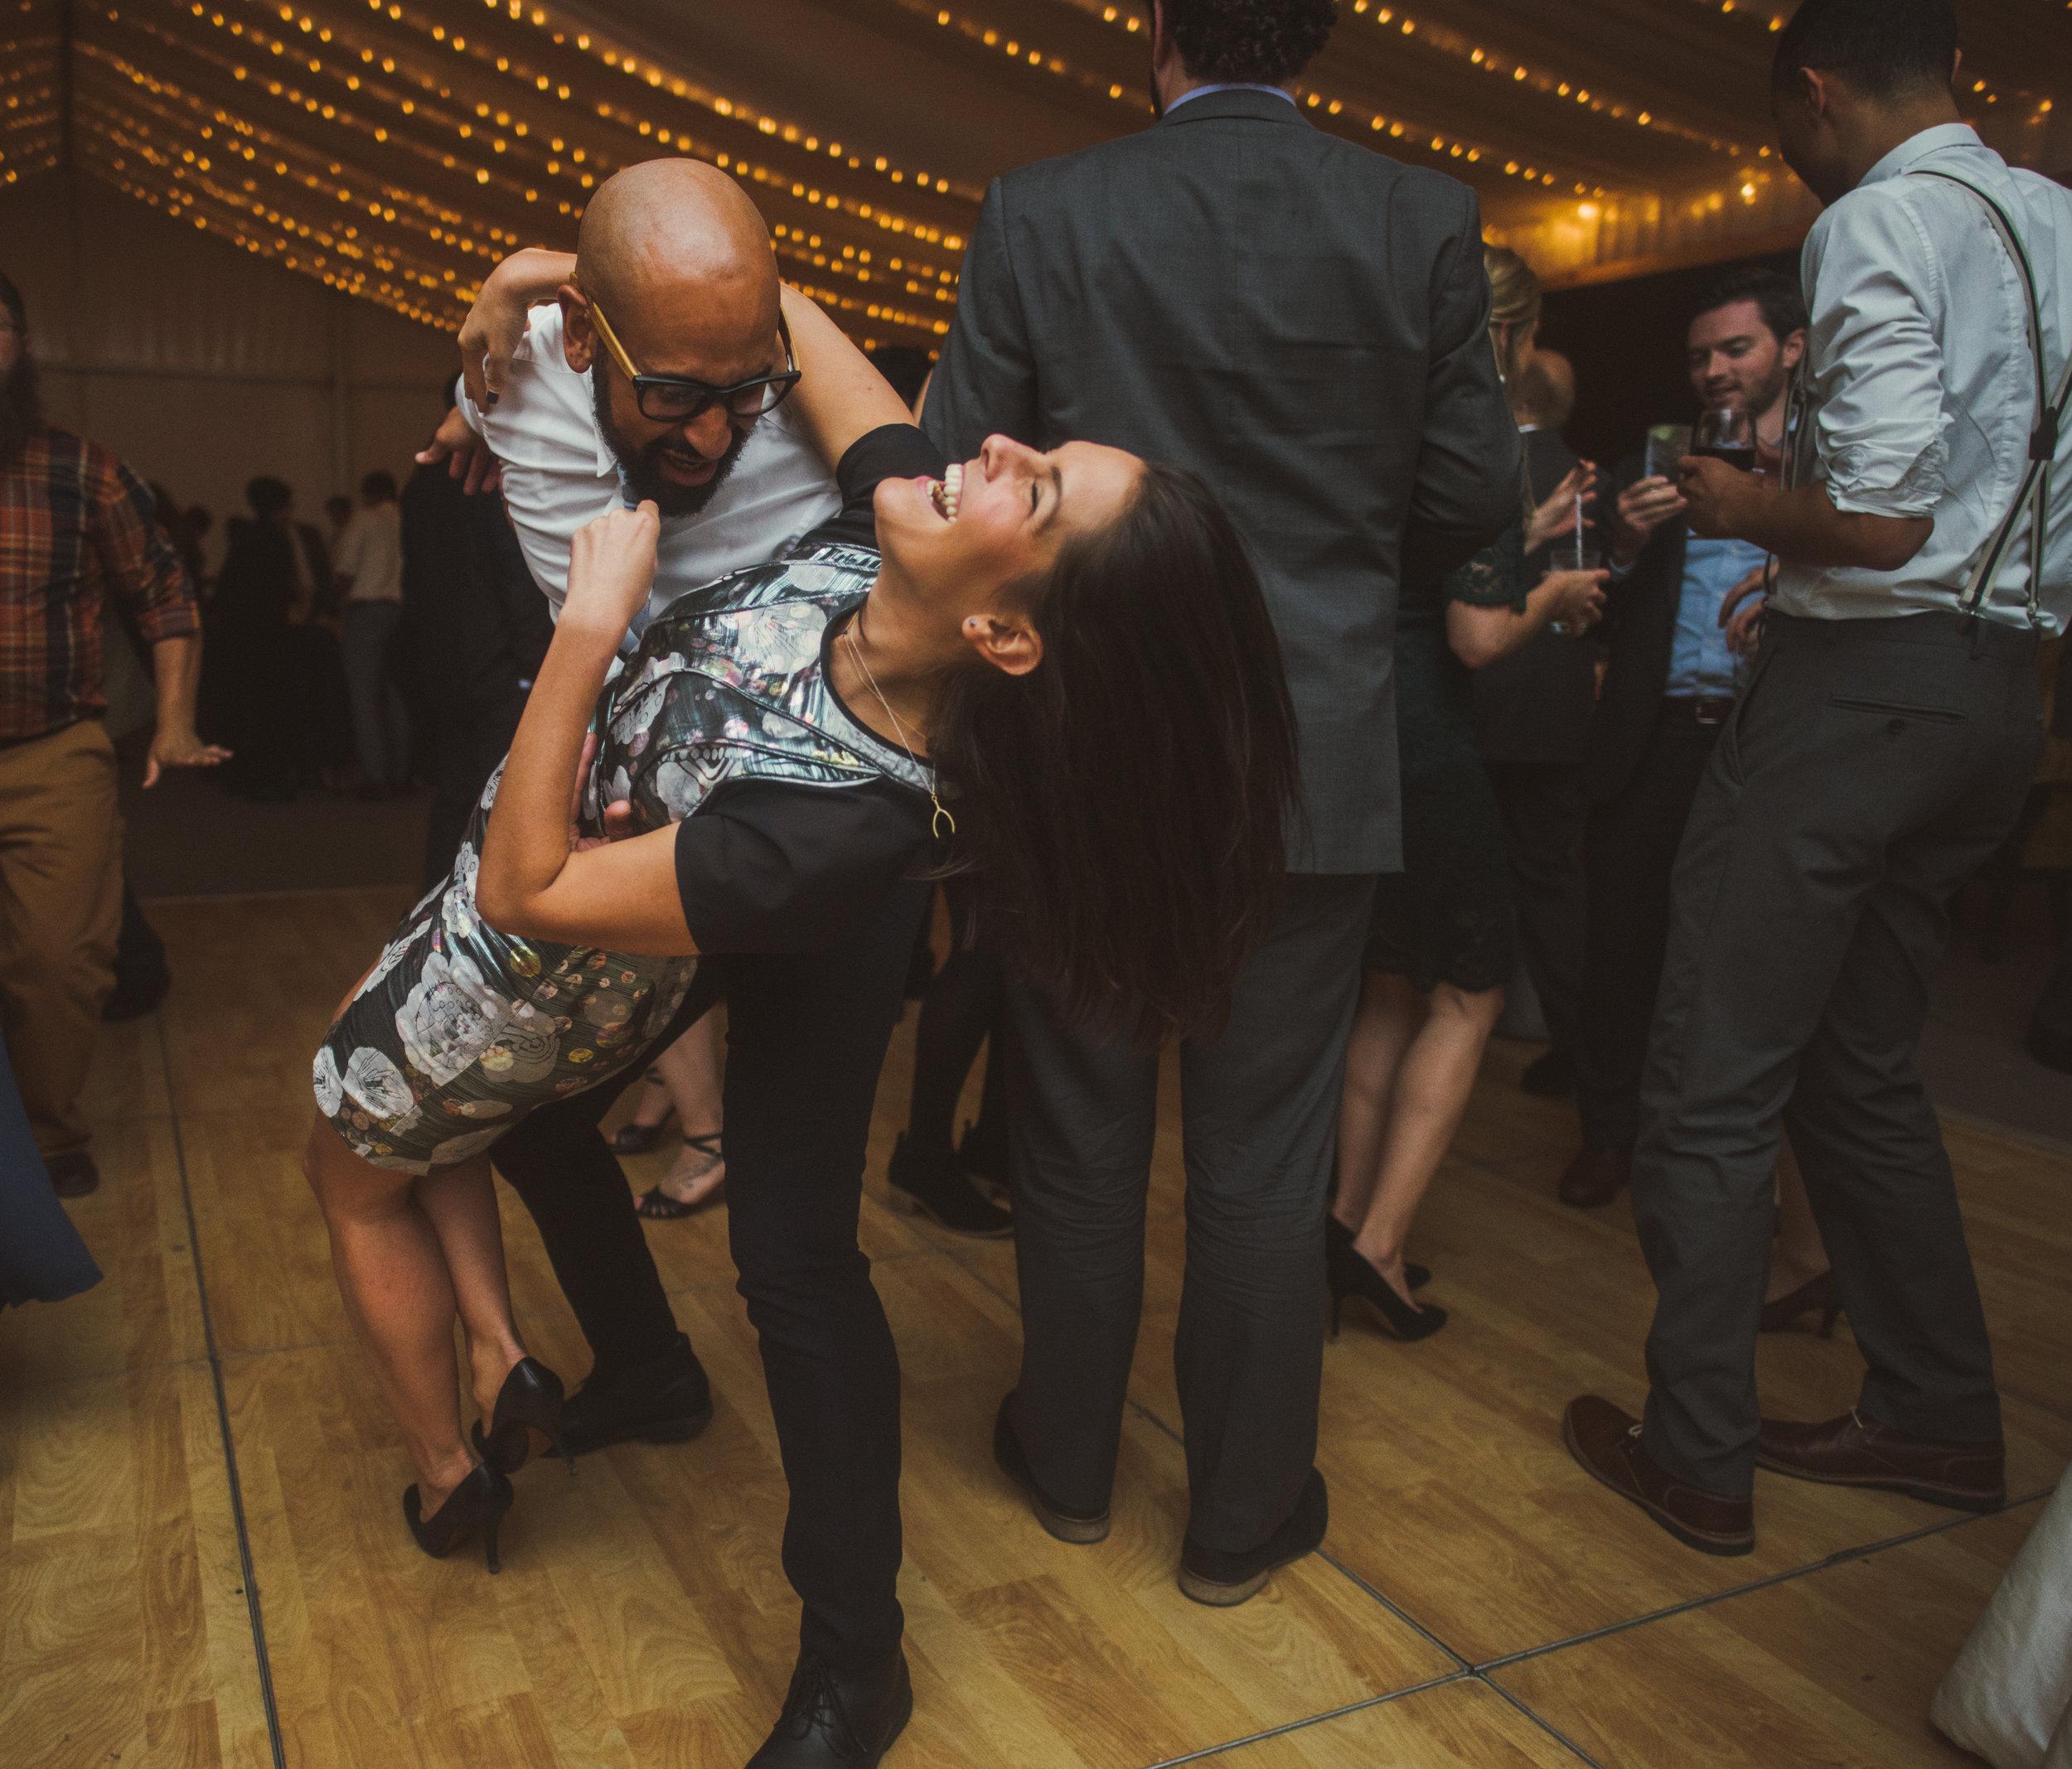 JACQUELINE & ANDREW WARSHAWER -BROOKMILL FARM FALL WEDDING - INTIMATE WEDDING PHOTOGRAPHER - TWOTWENTY by CHI-CHI AGBIM-689.jpg